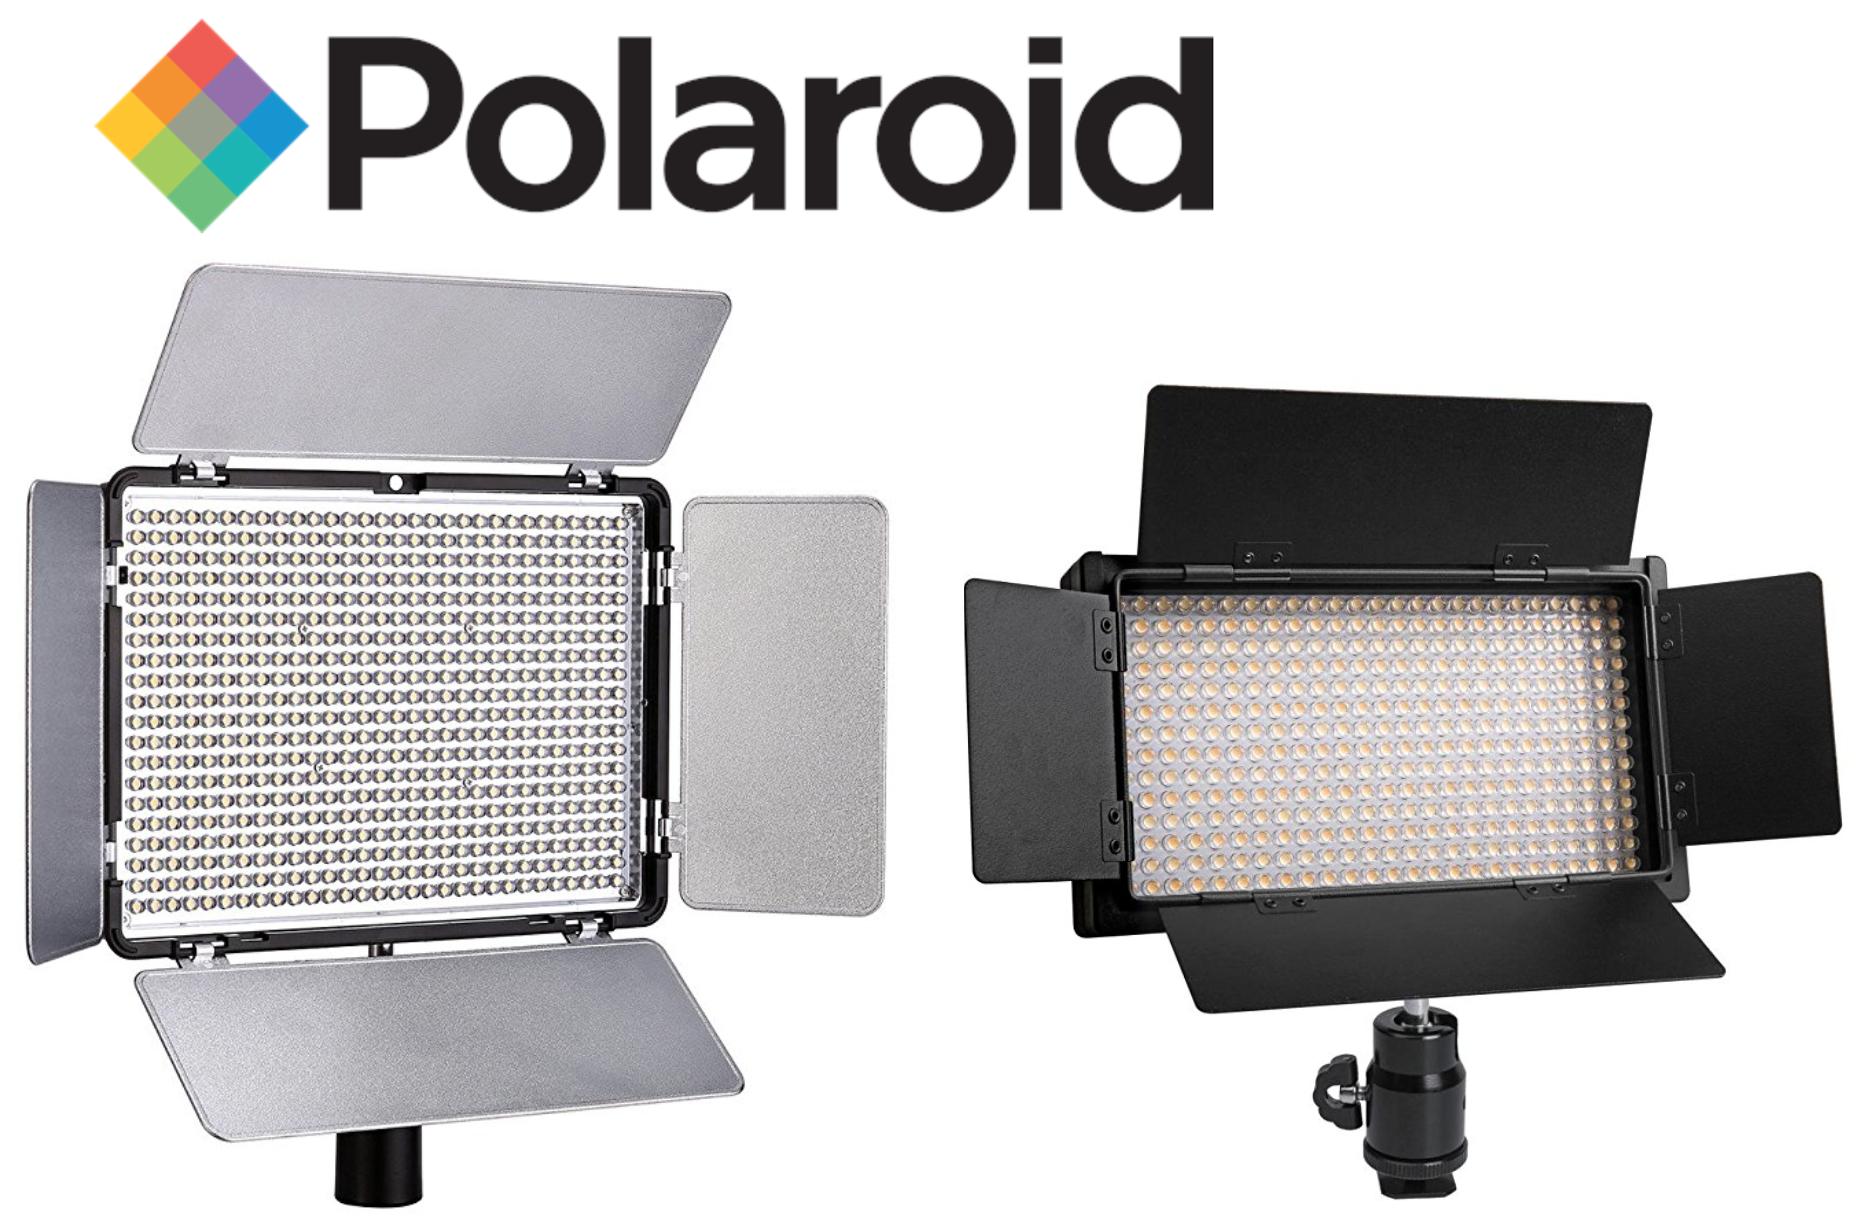 Polaroid Small Portable Led Production